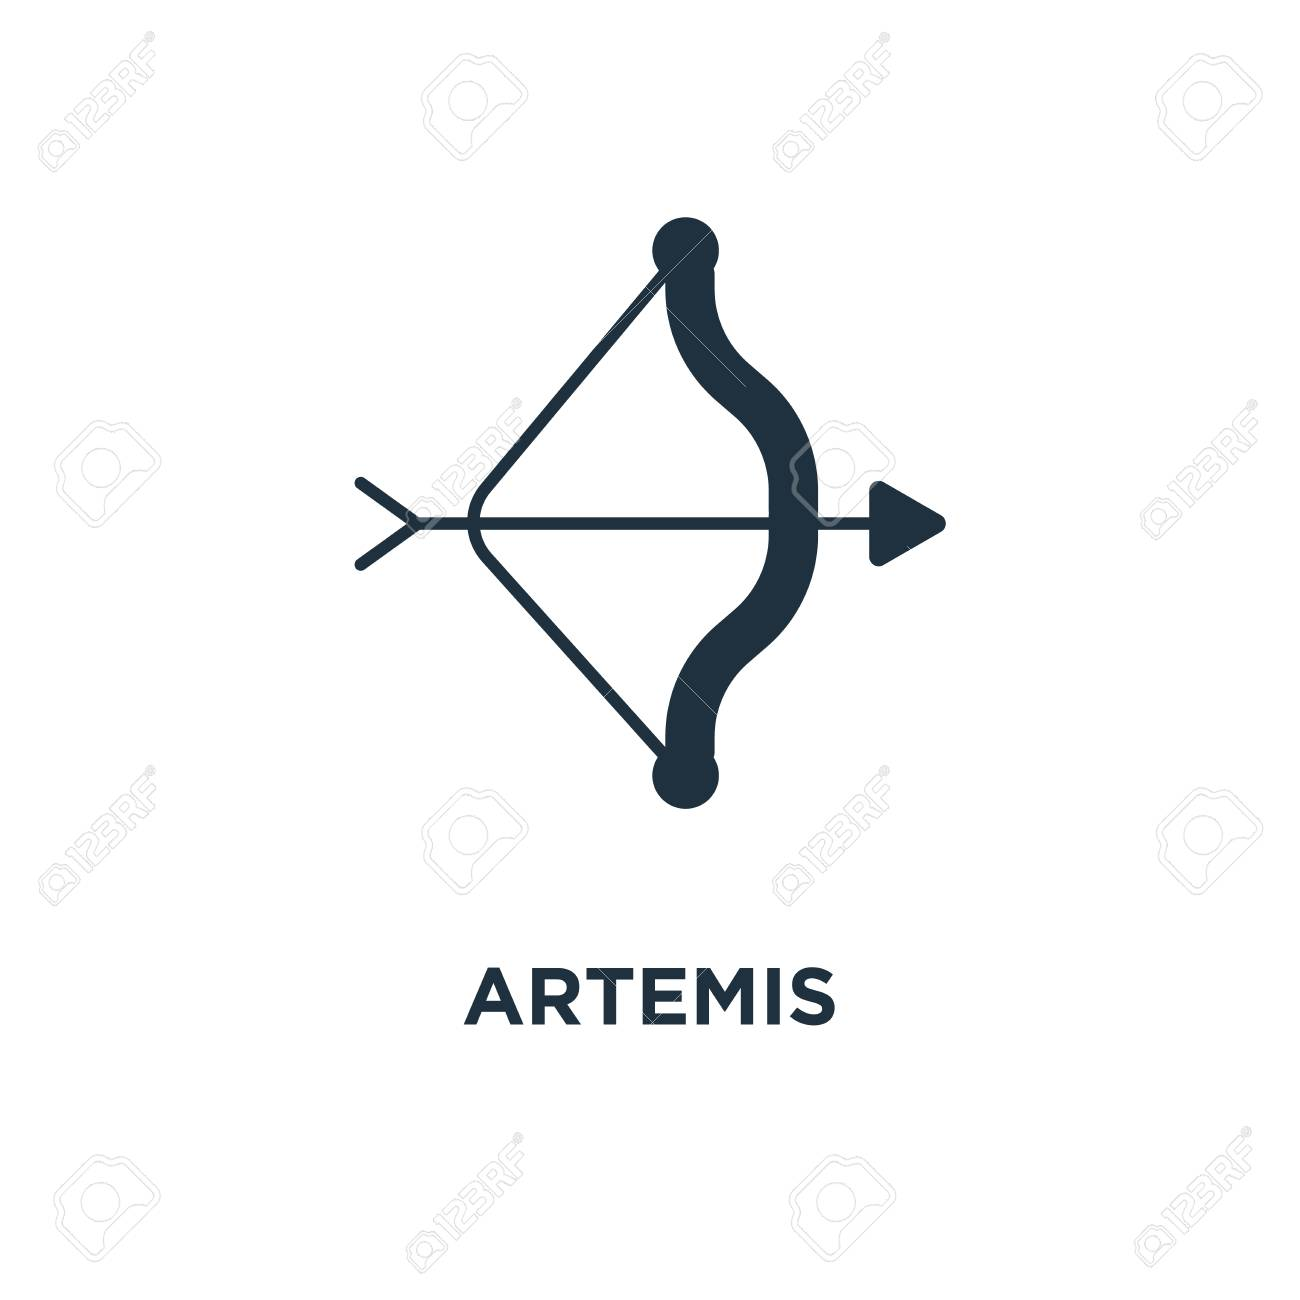 Artemis Icon Black Filled Vector Illustration Artemis Symbol